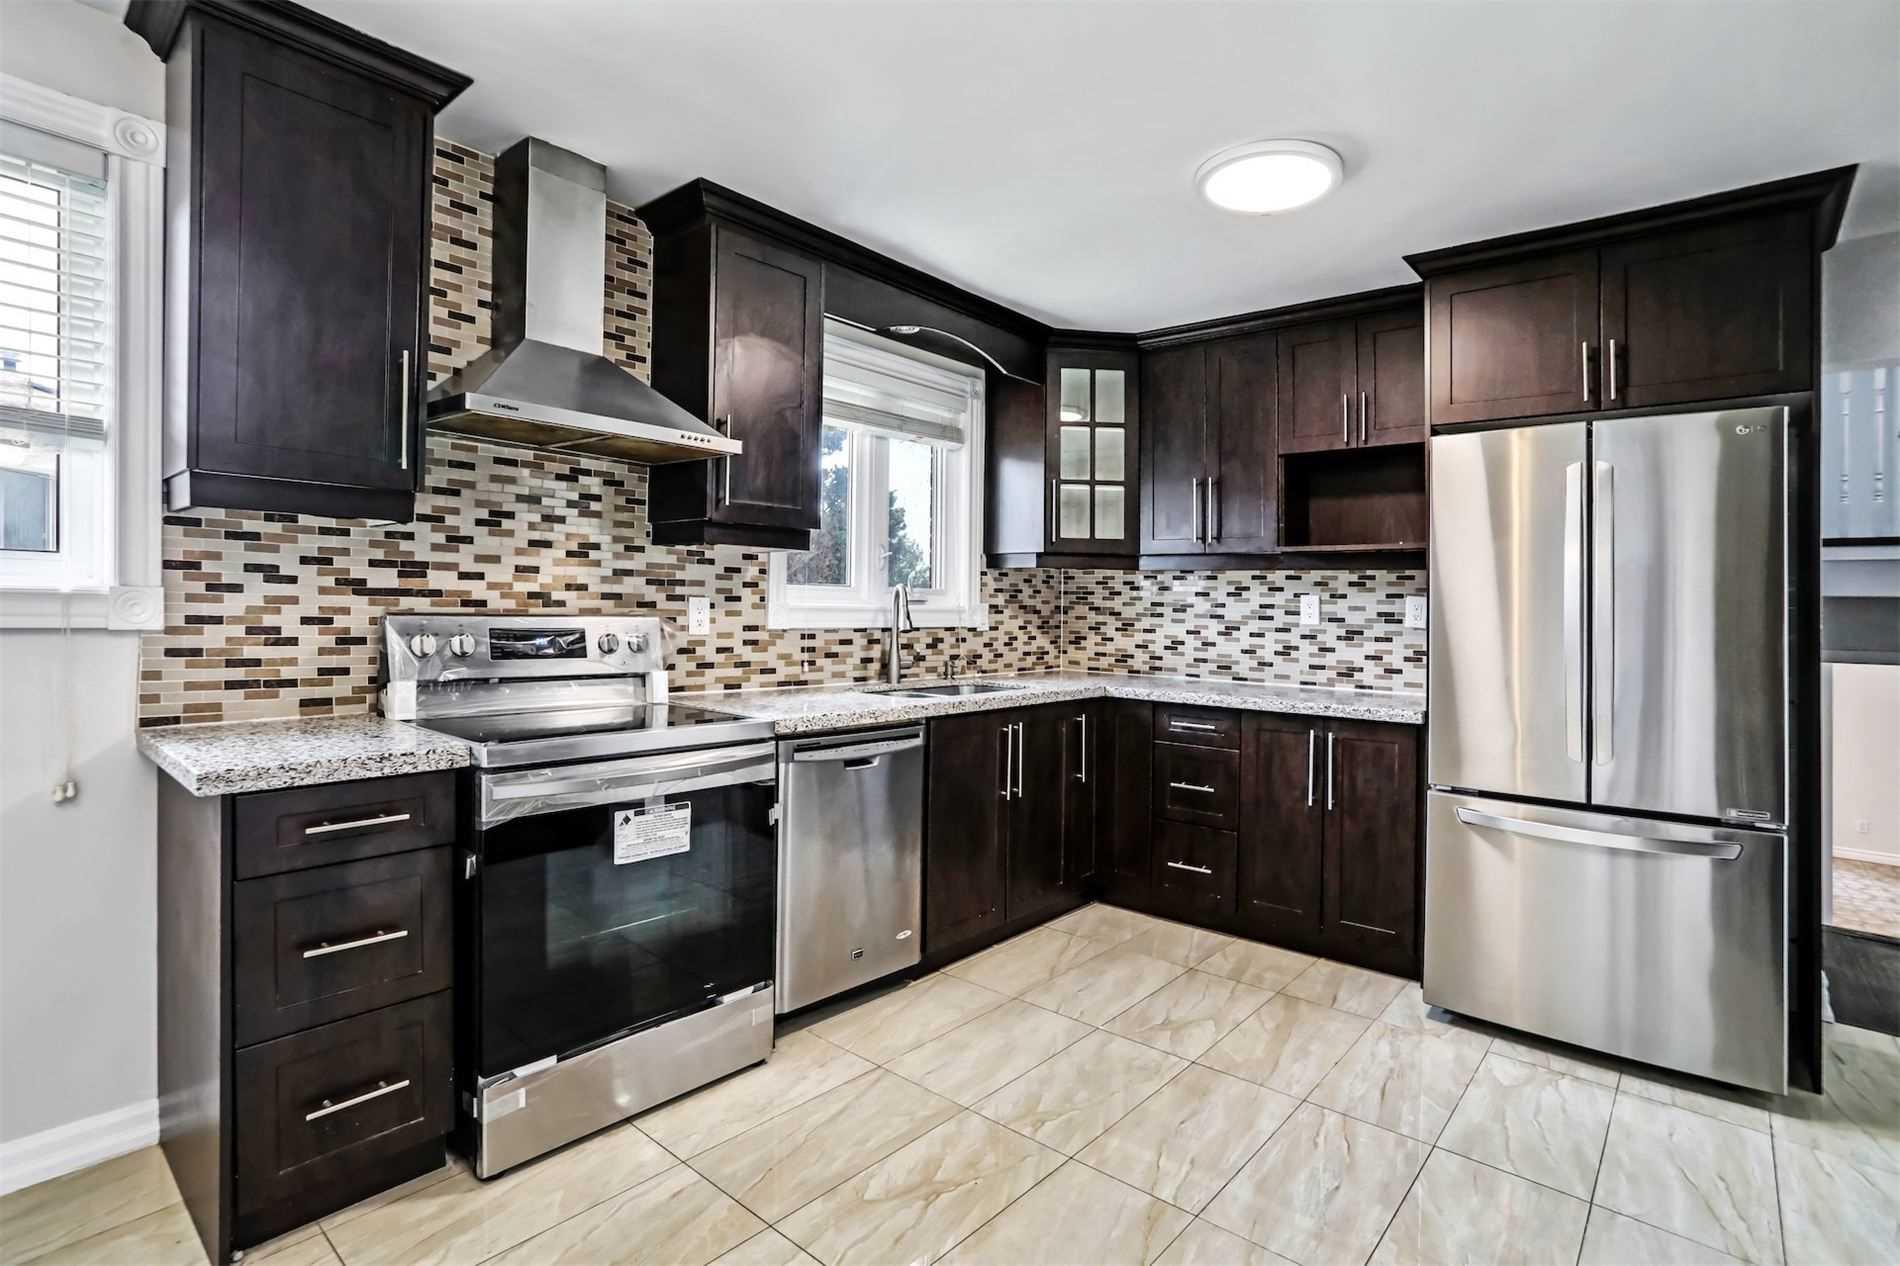 House For Sale 16 Kingsdown Dr, M1K3B8, Ionview, Toronto